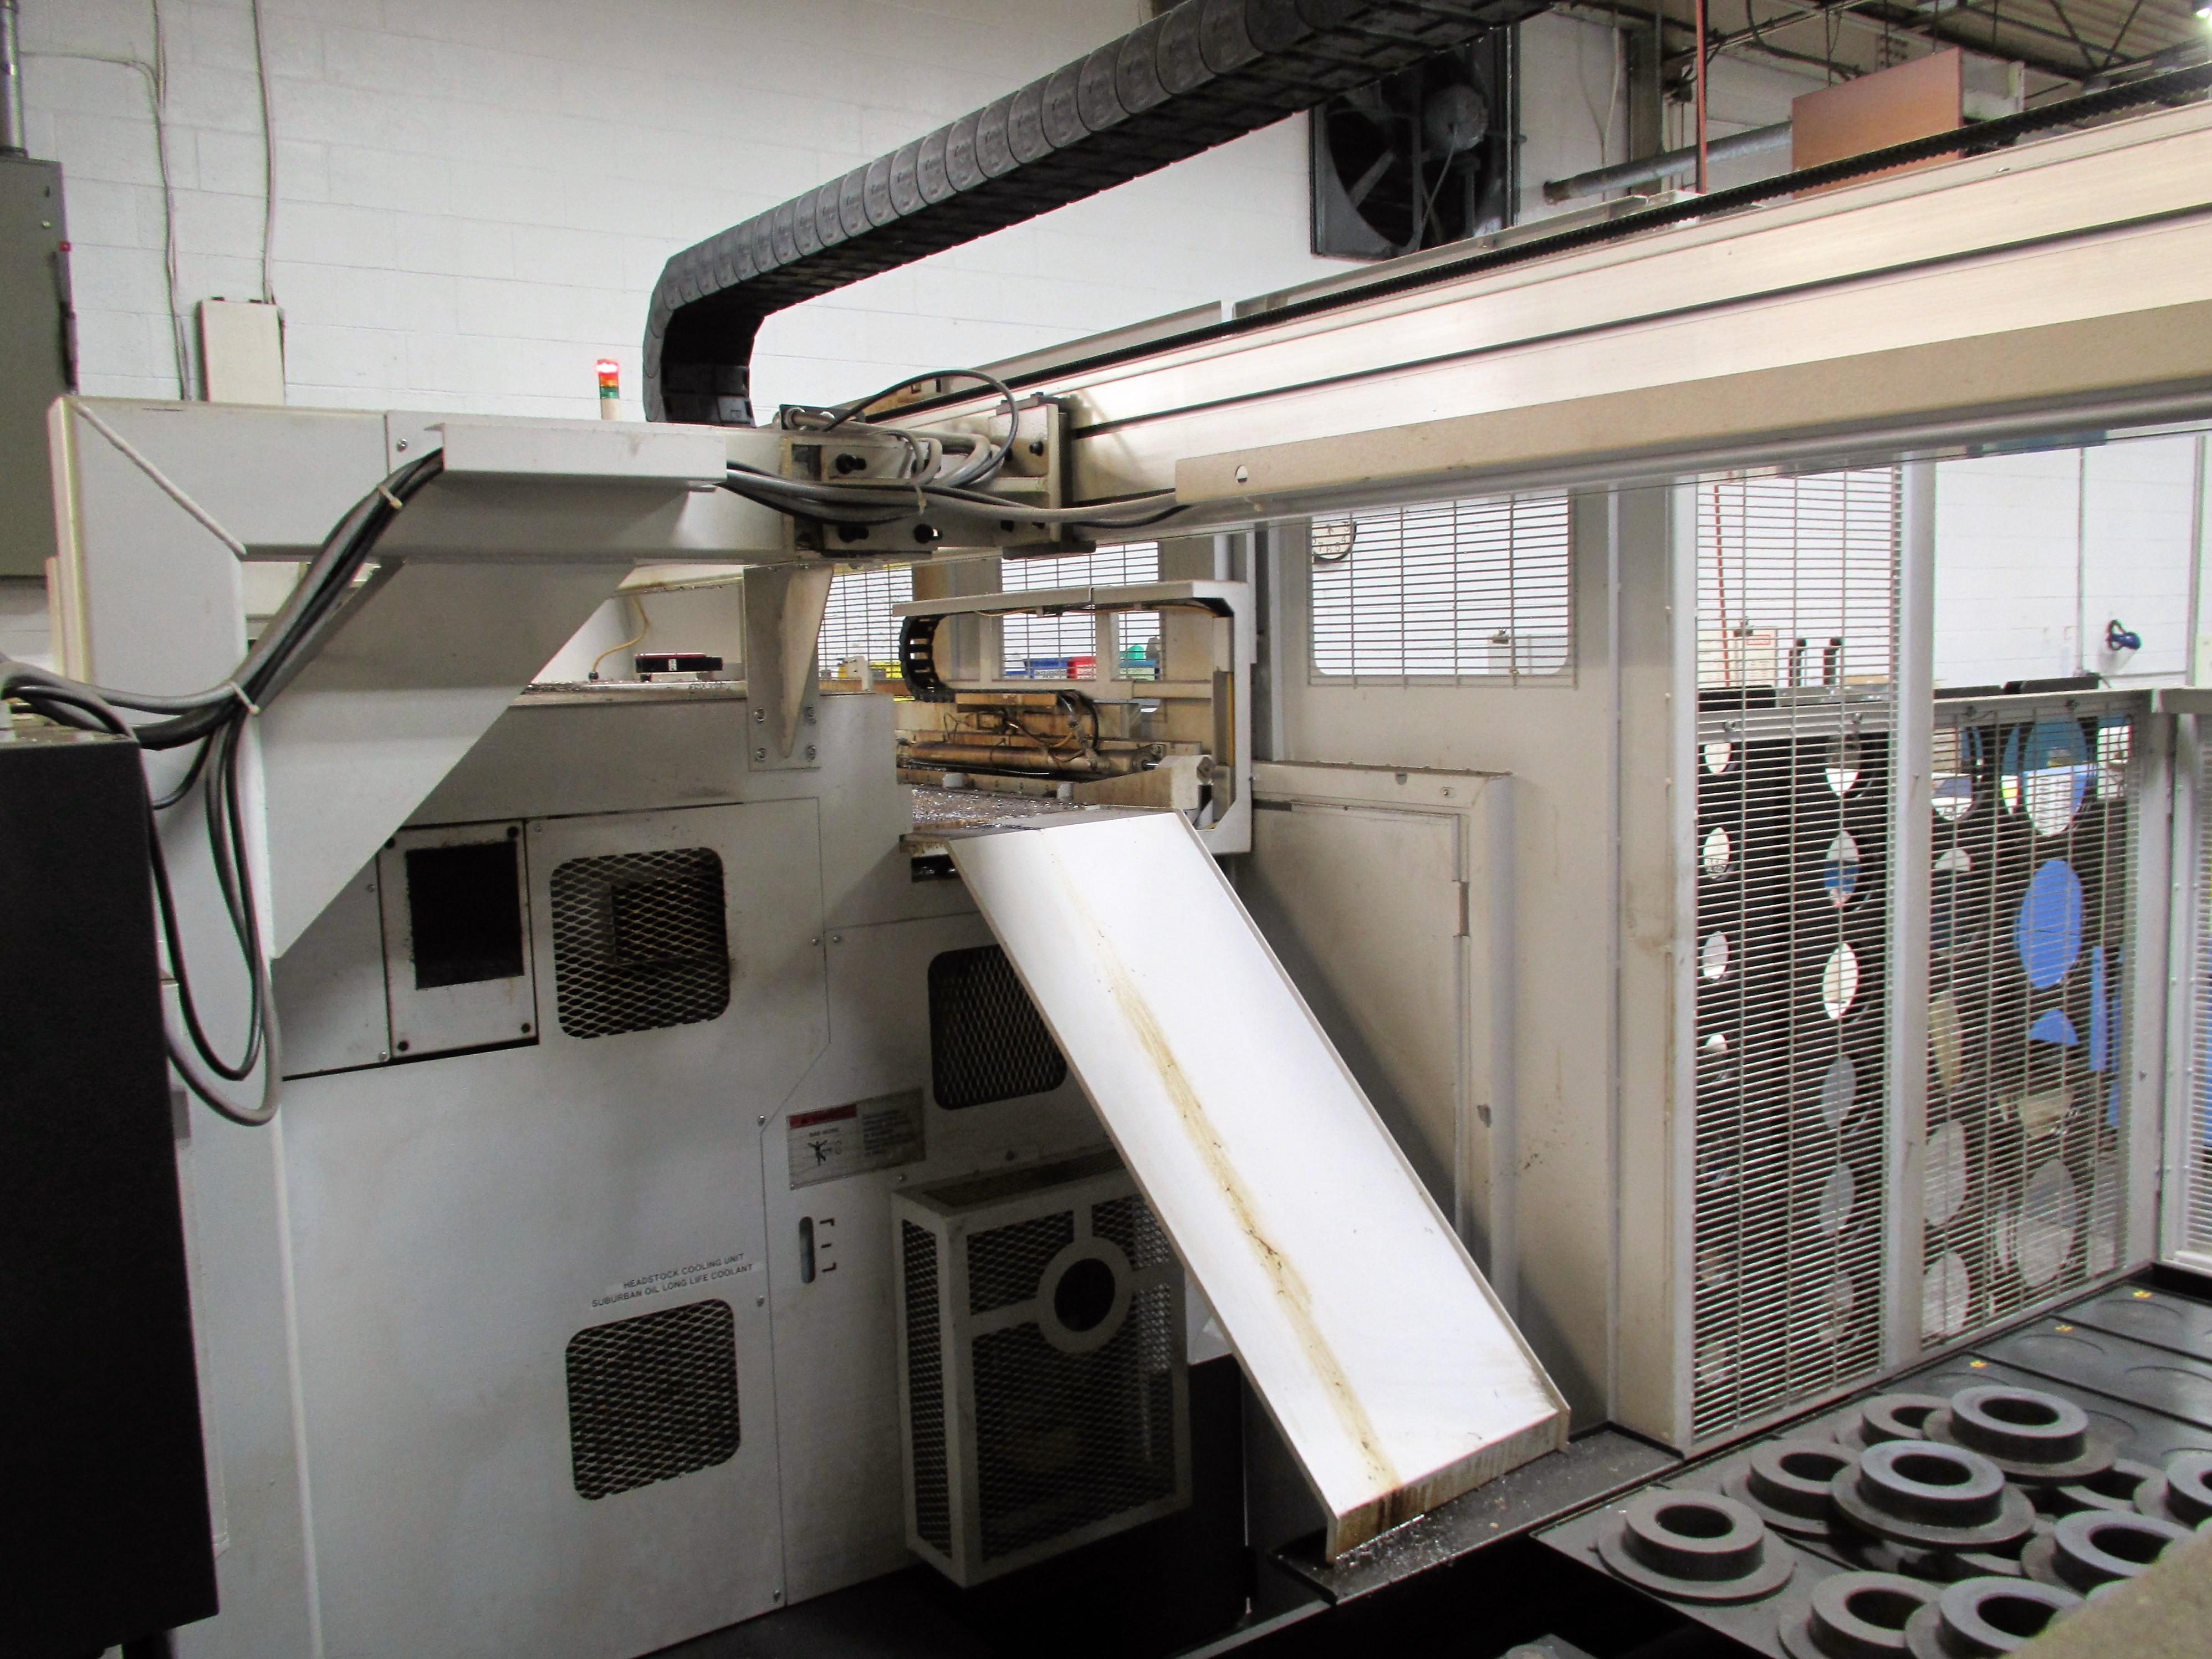 MAZAK QUICK TURN NEXUS 250-II MSY CNC TURNING CENTER - Image 15 of 16